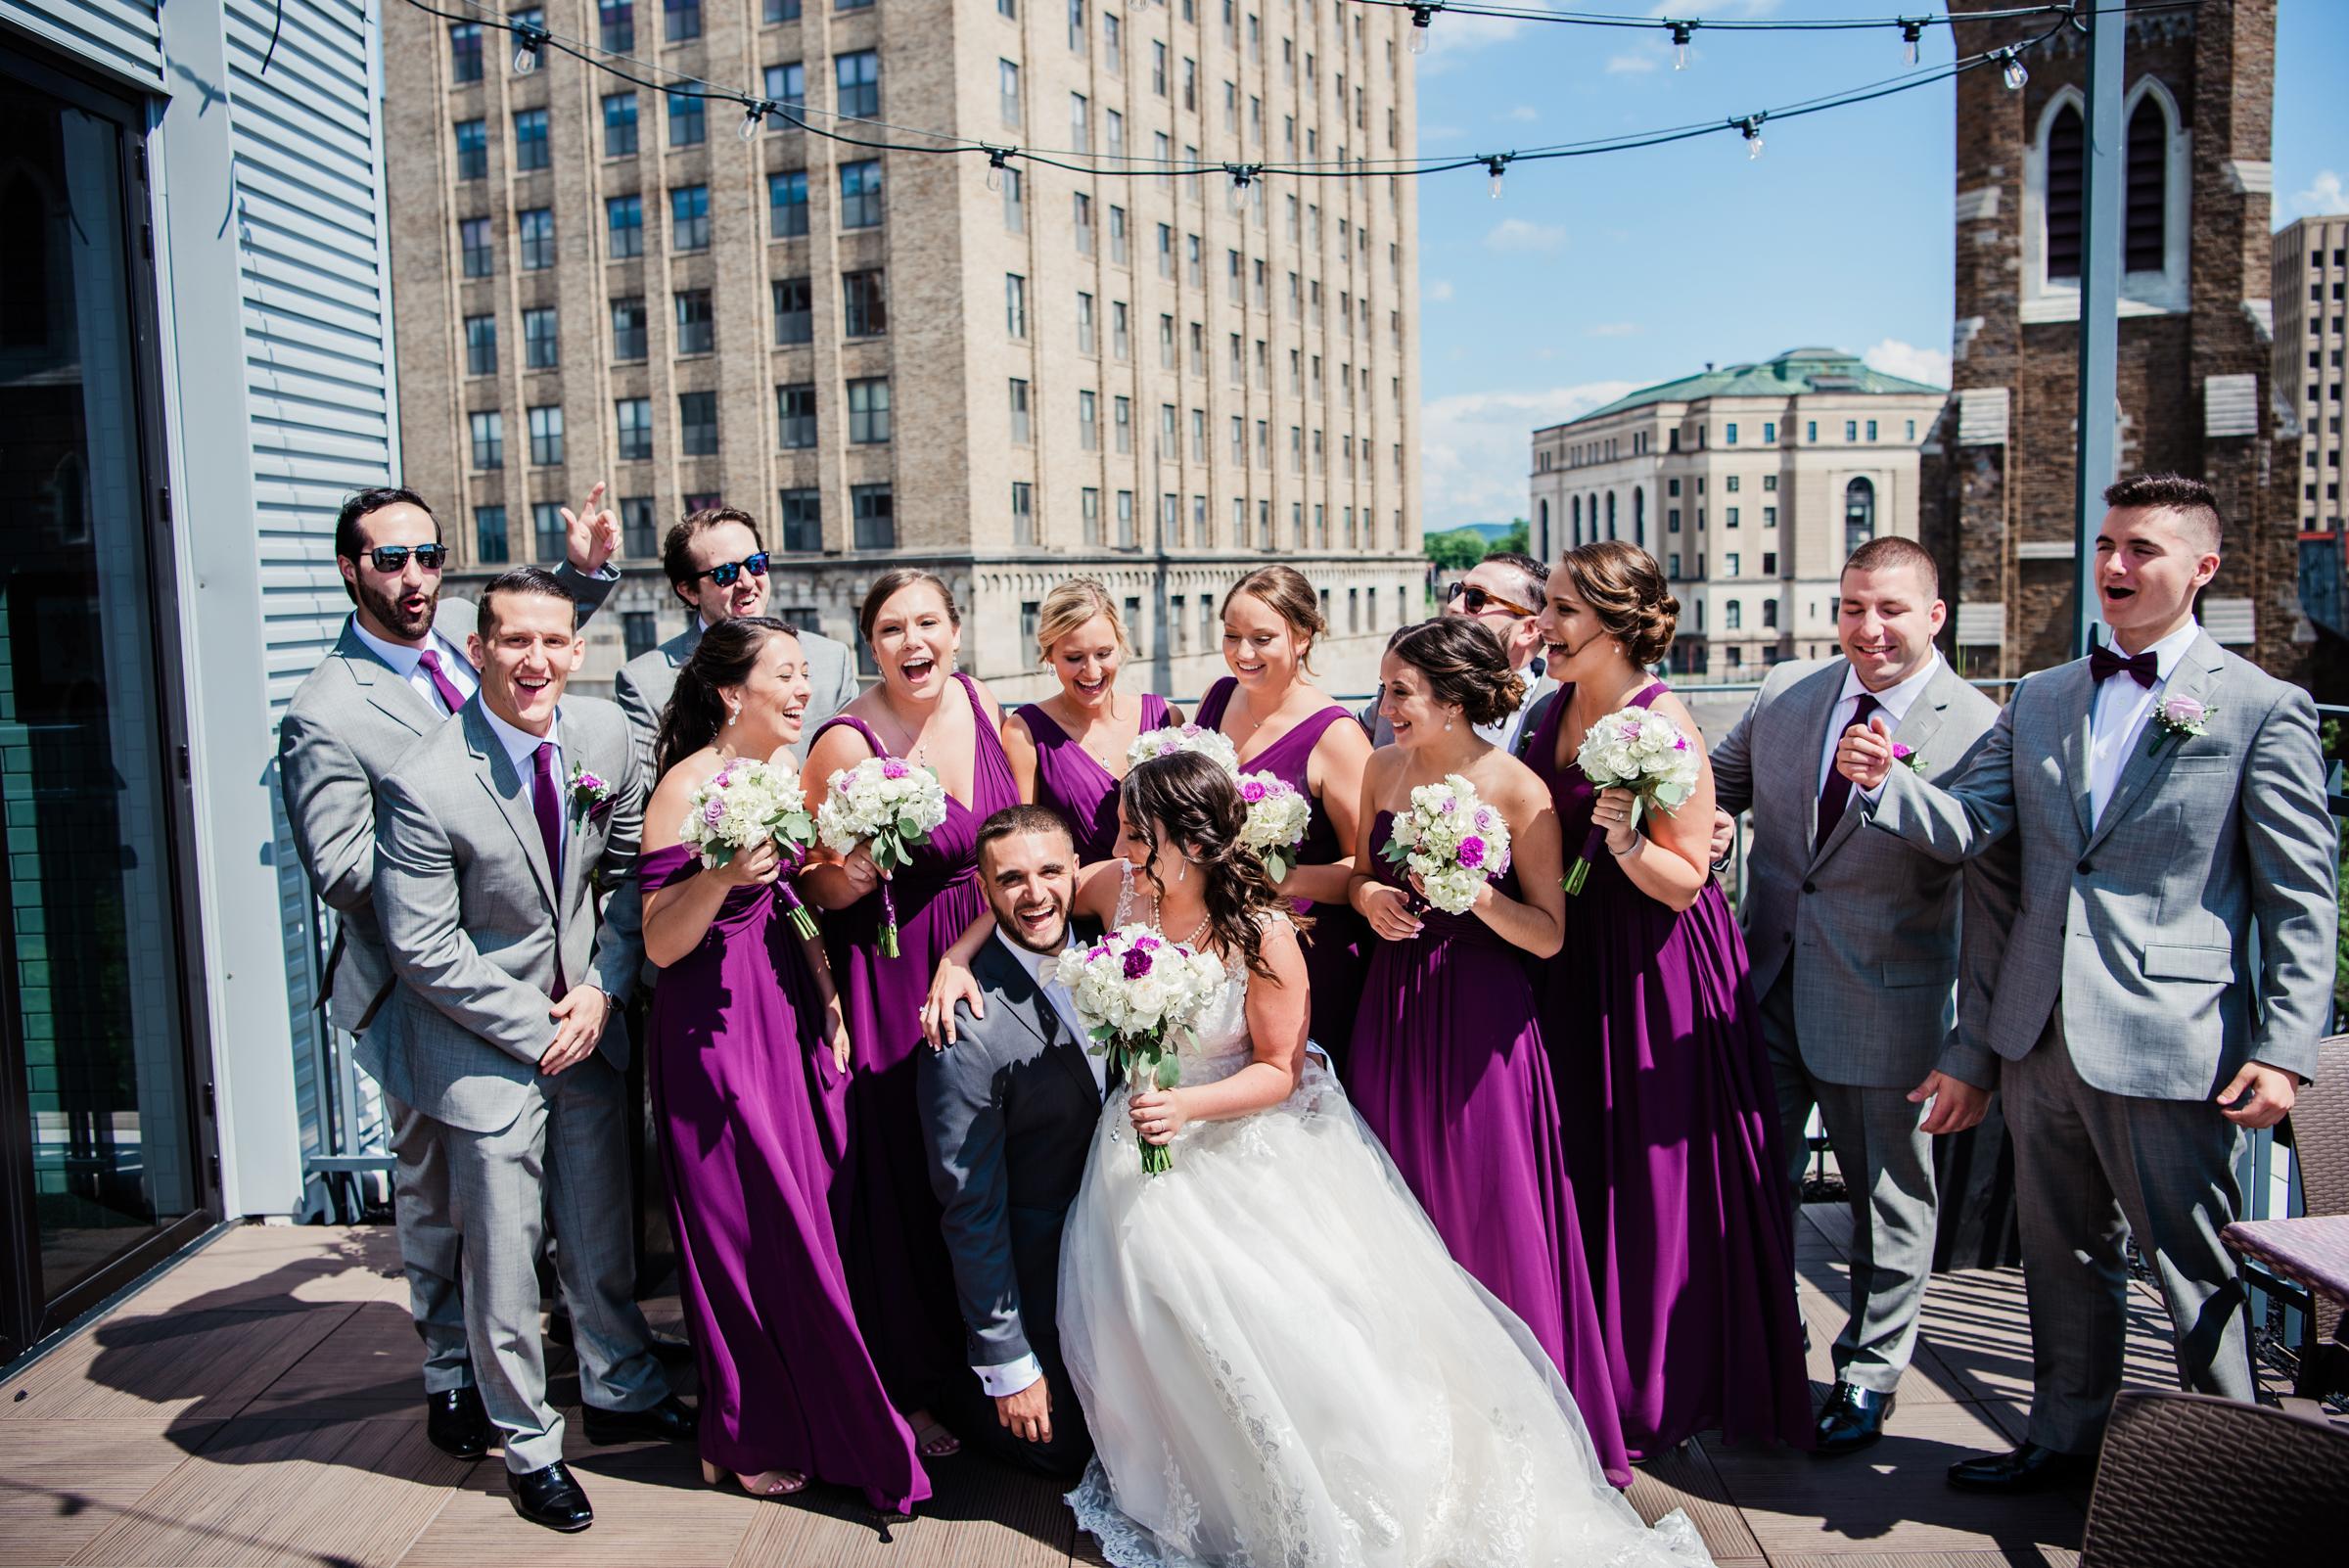 Historic_Old_St_Johns_Church_Valentinos_Banquet_Hall_Central_NY_Wedding_JILL_STUDIO_Rochester_NY_Photographer_DSC_6052.jpg